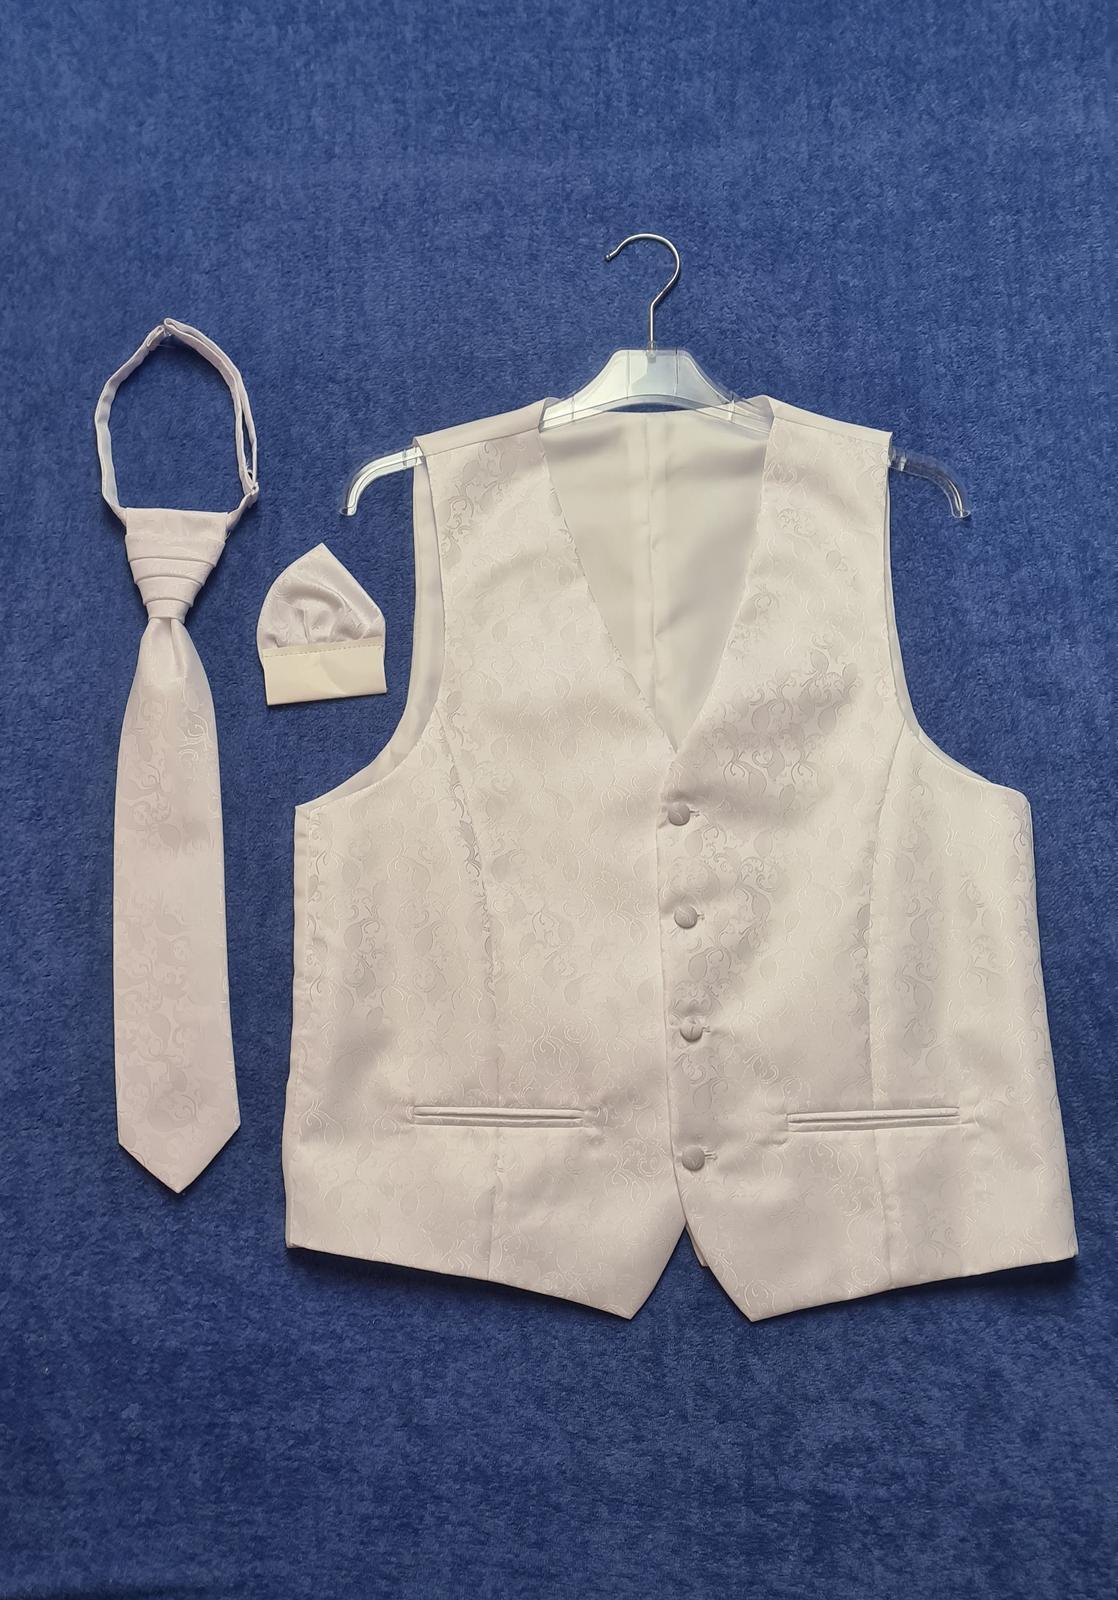 snehobiely set - vesta, kravata, vreckovka v.46 - Obrázok č. 1